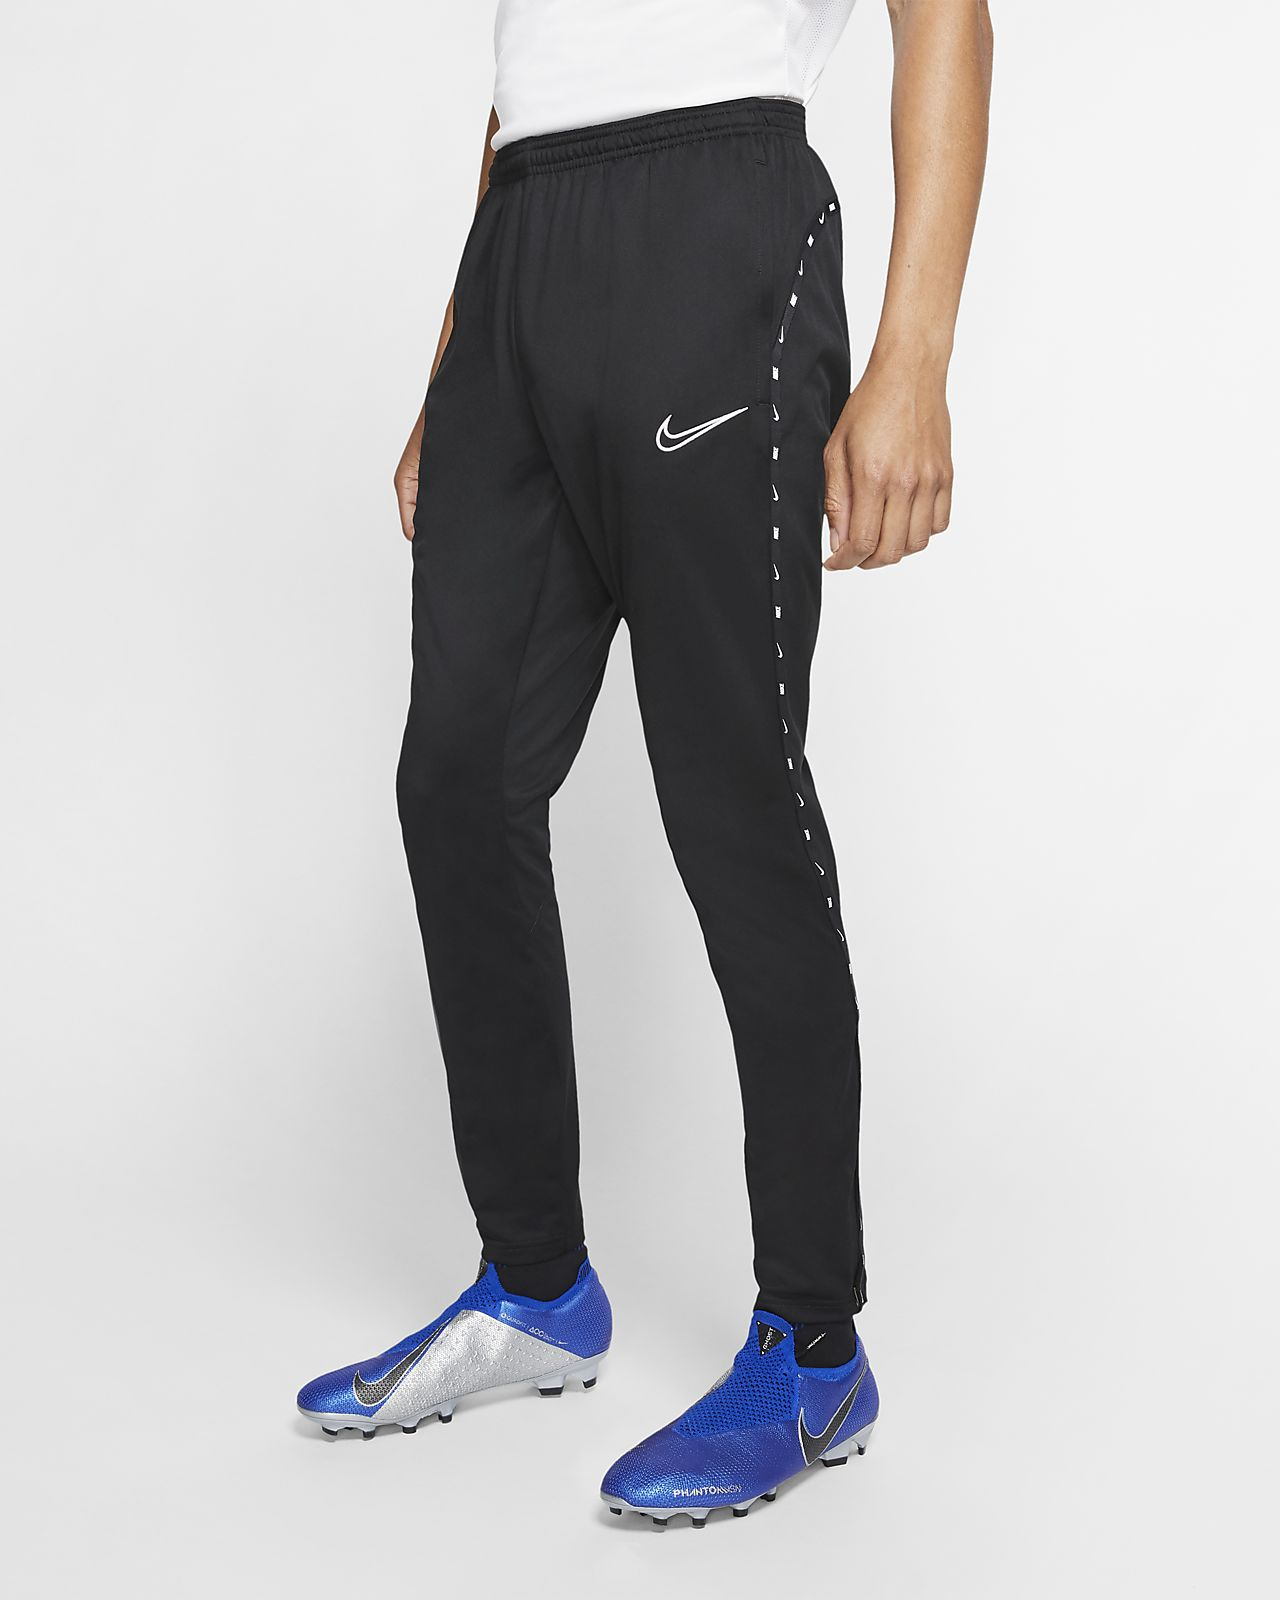 Nike Herren Dry Academy 18 Trainingsanzug | Fußball